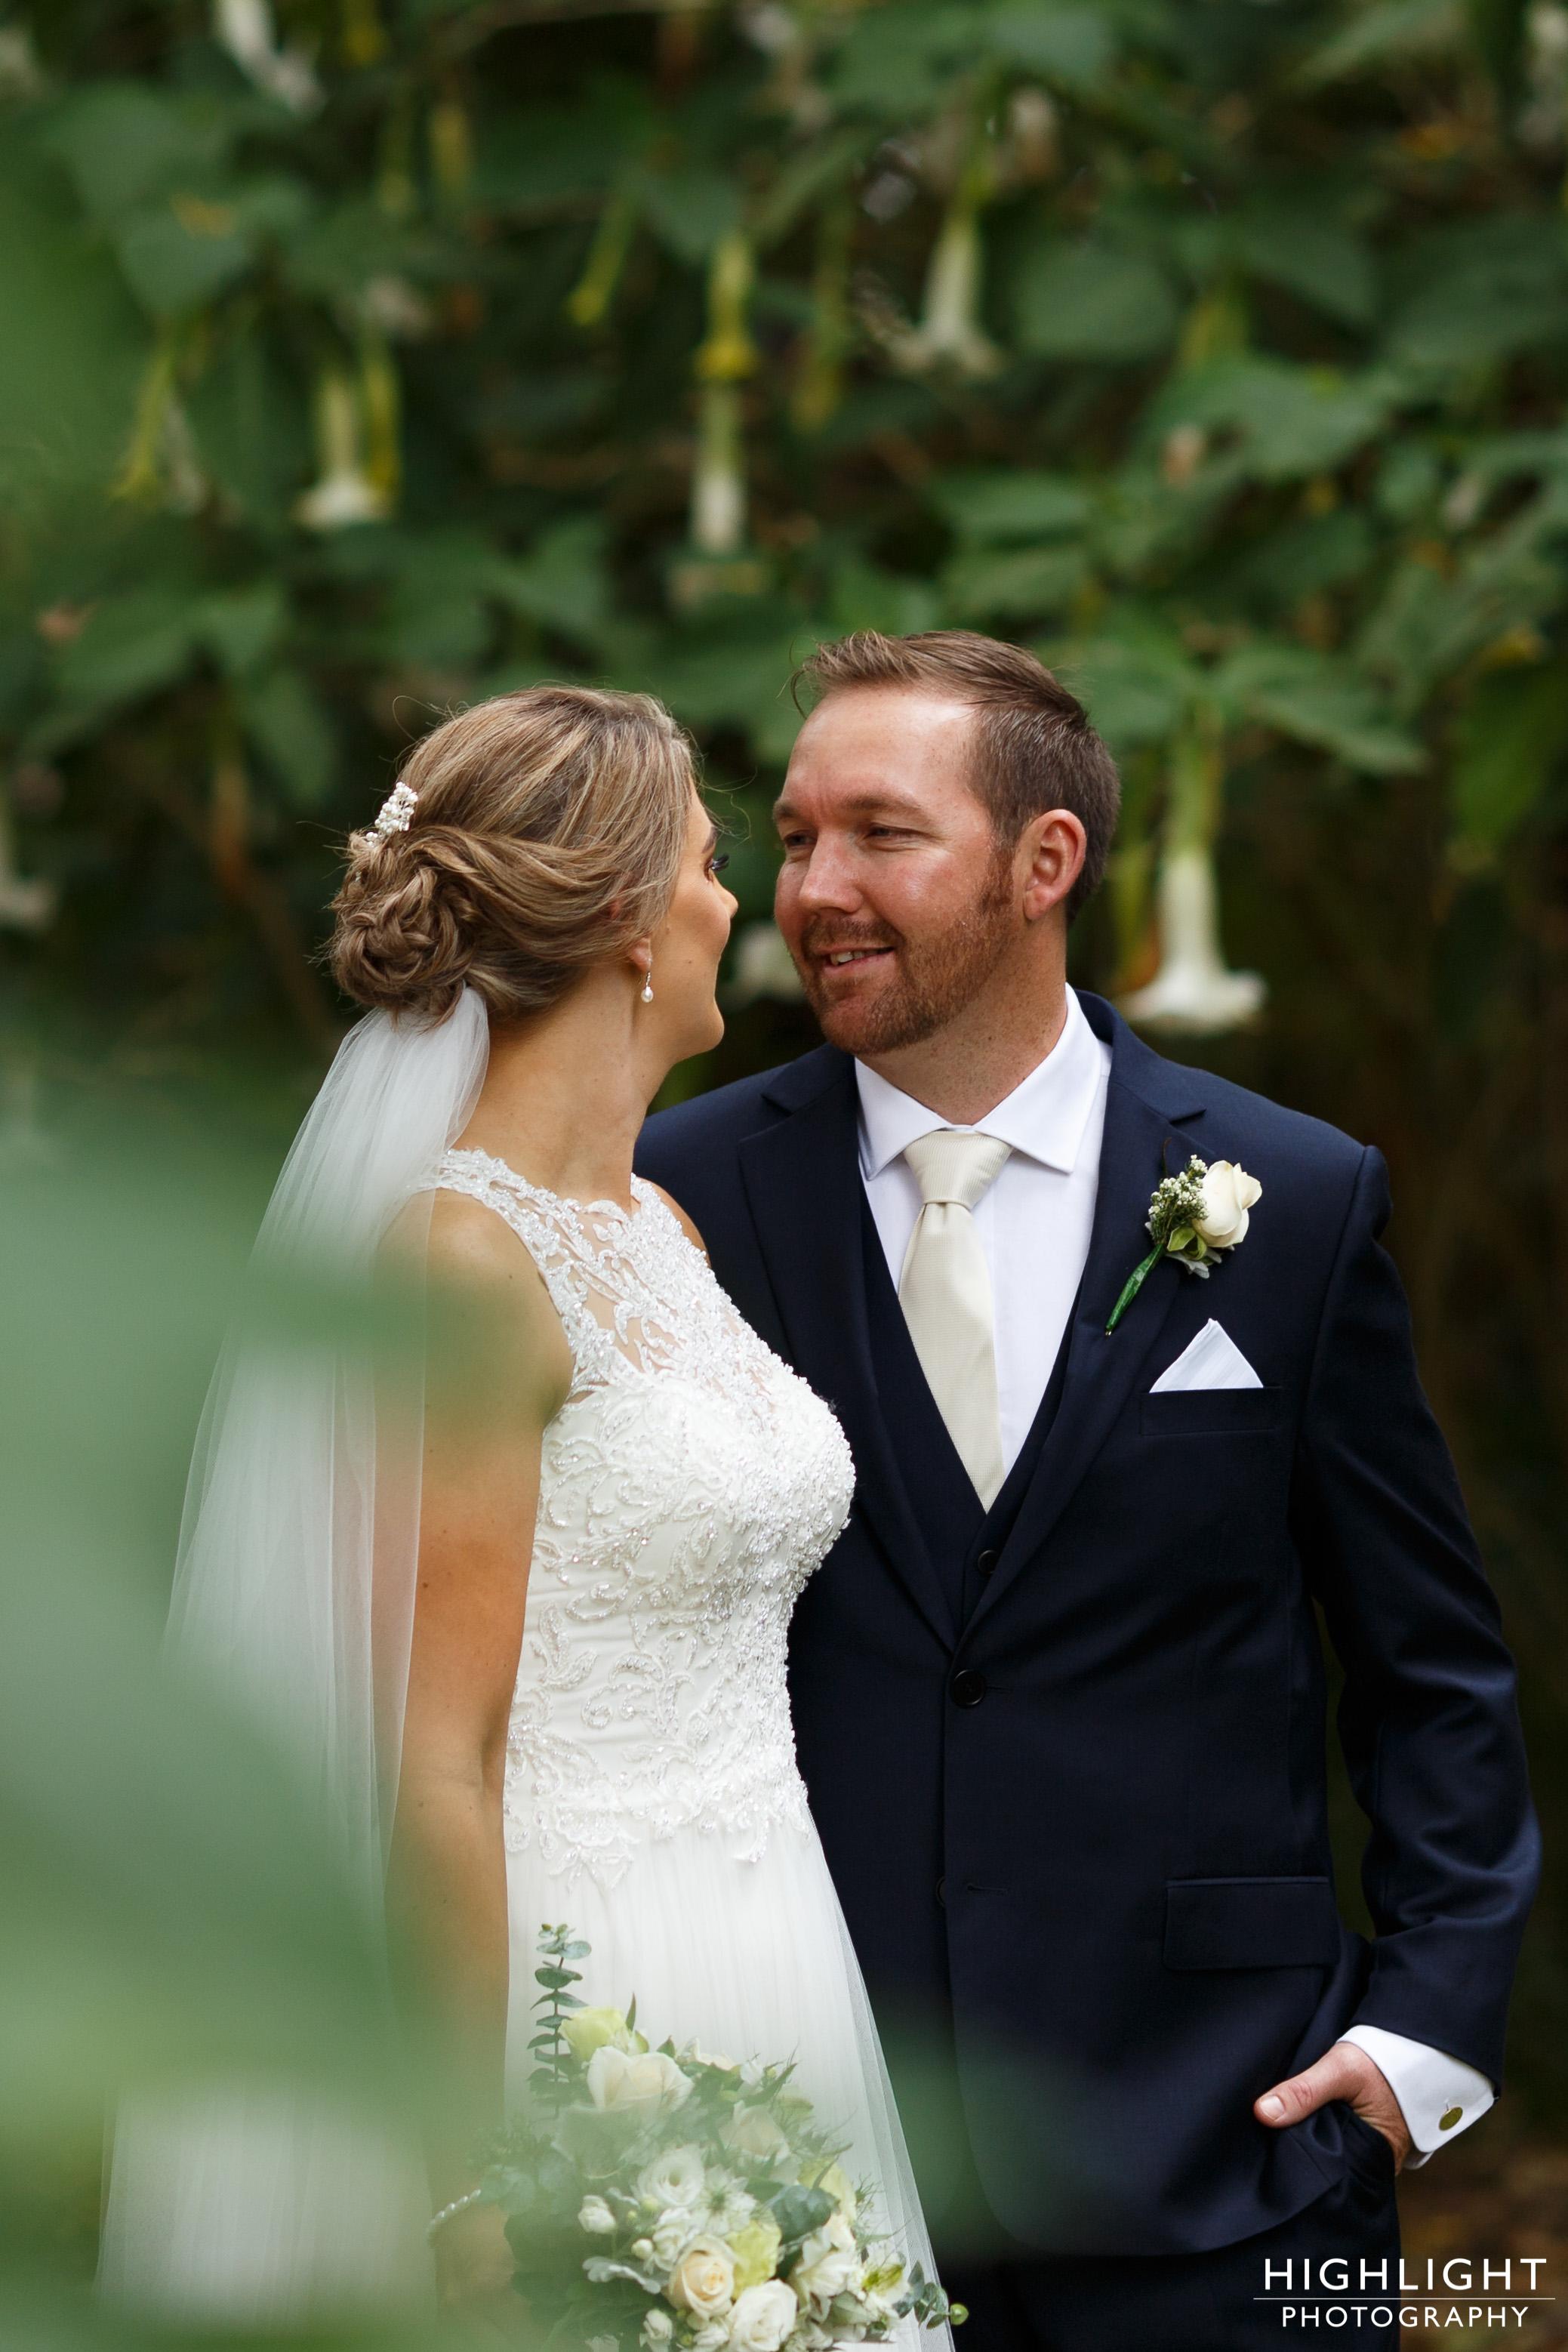 highlight-wedding-photography-palmerston-north-new-zealand-orlando-country-club-wedding-59.jpg